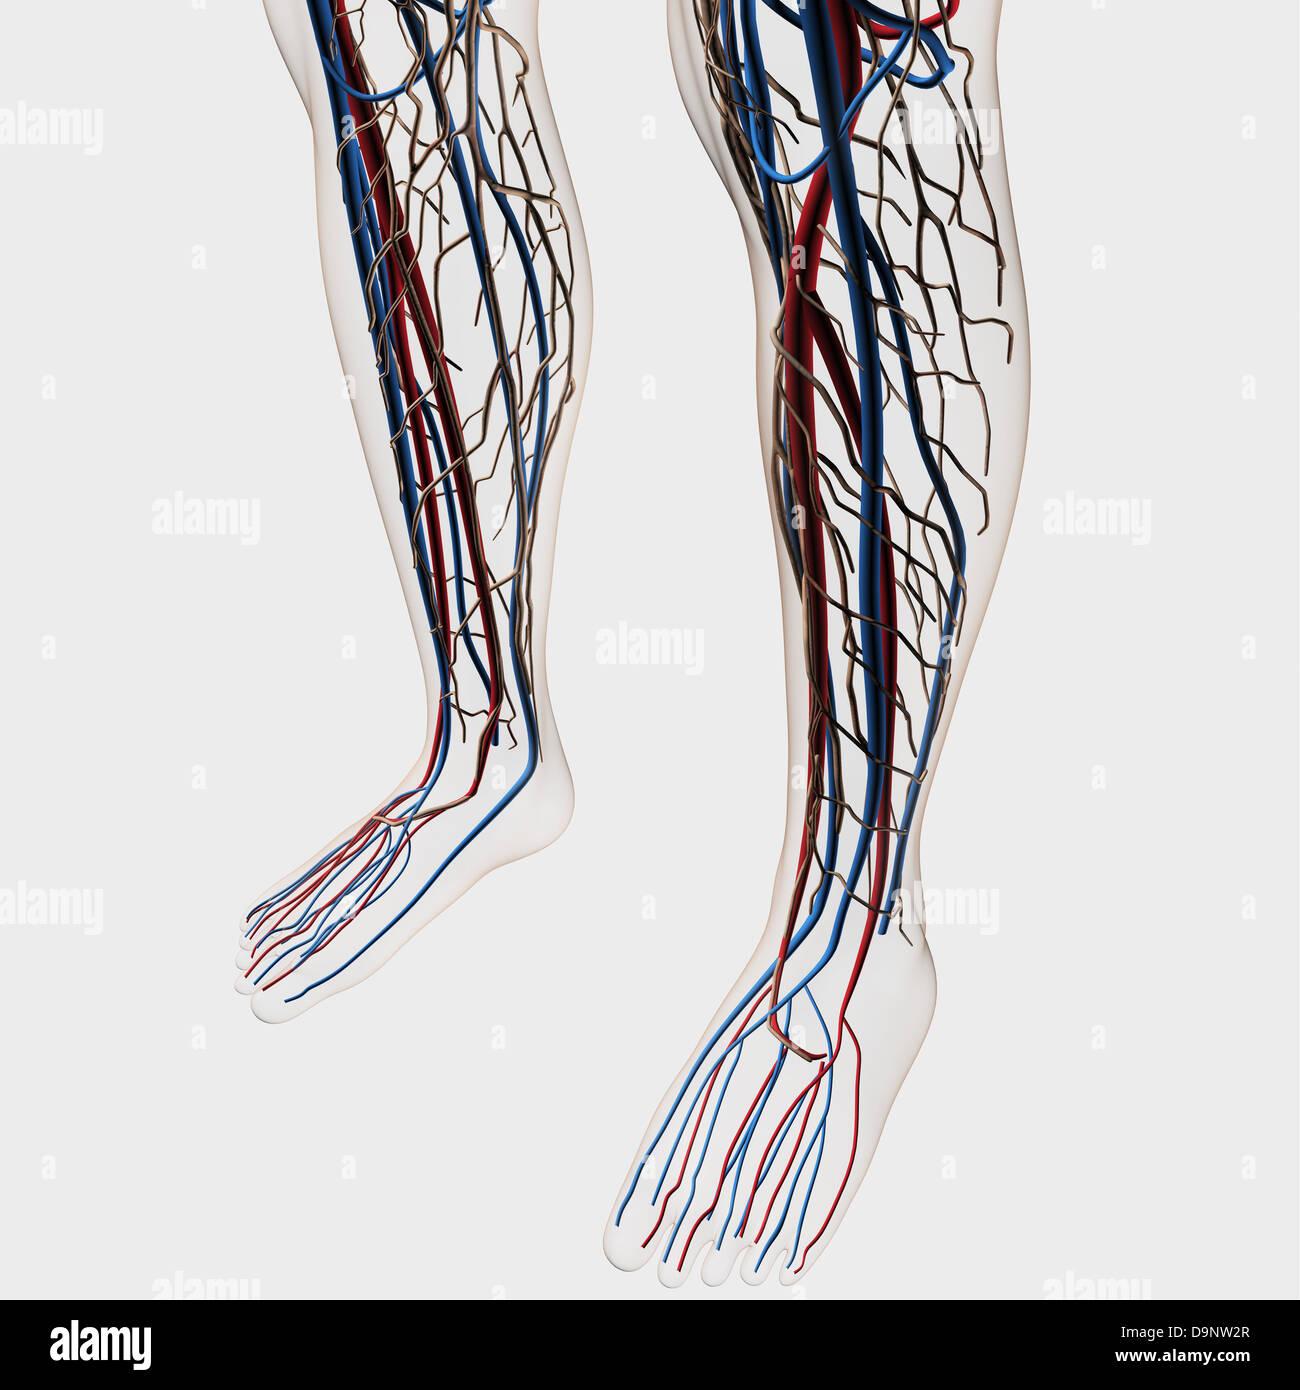 Artery Legs Stockfotos & Artery Legs Bilder - Alamy